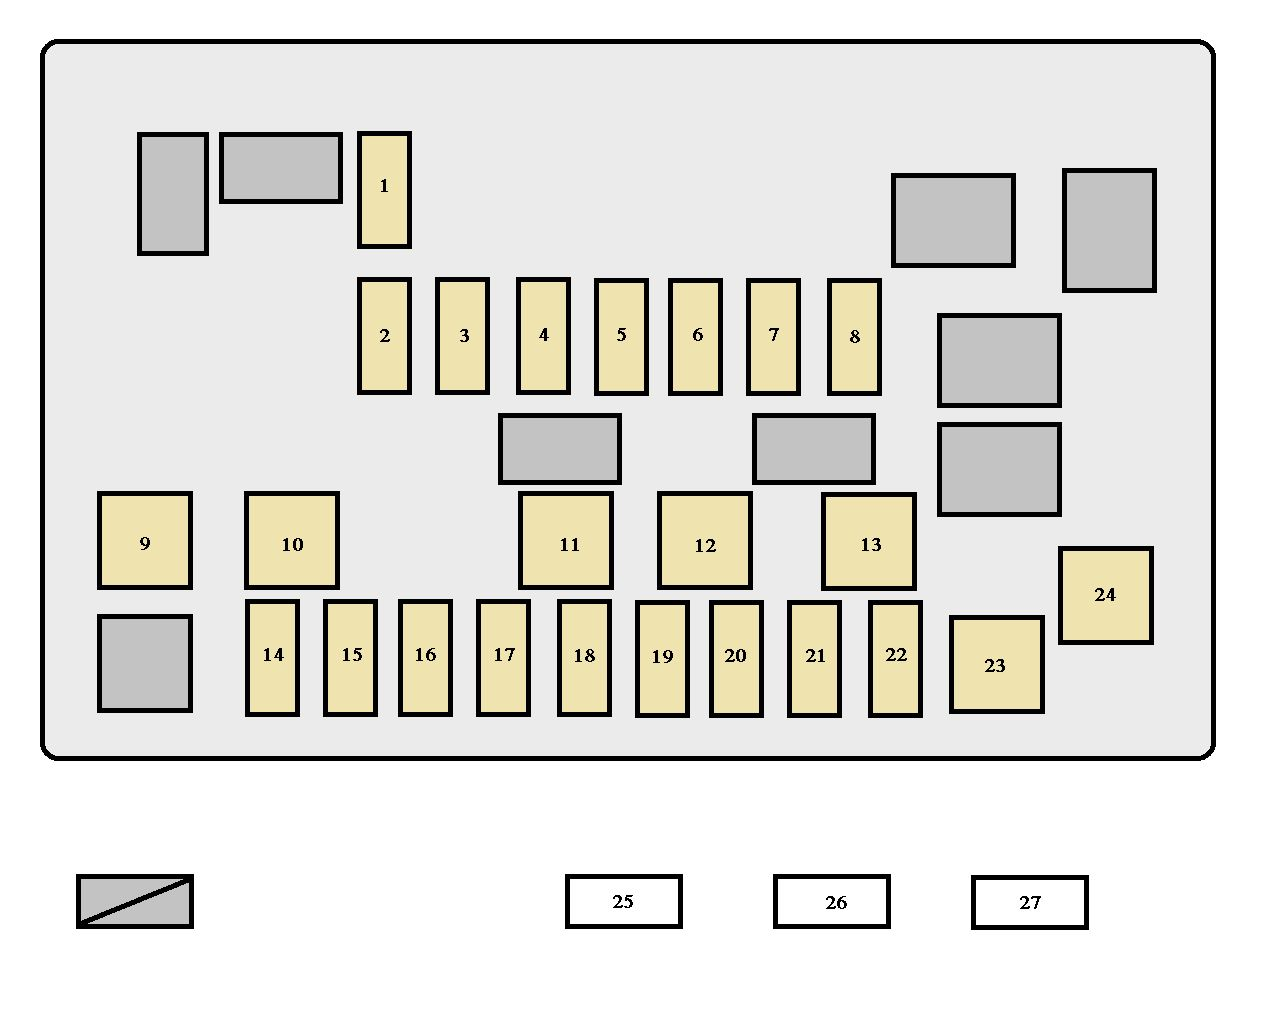 code alarm ca1051 wiring diagram diagrams for subs fuse www kwclan co rh 49 malibustixx de ca1055